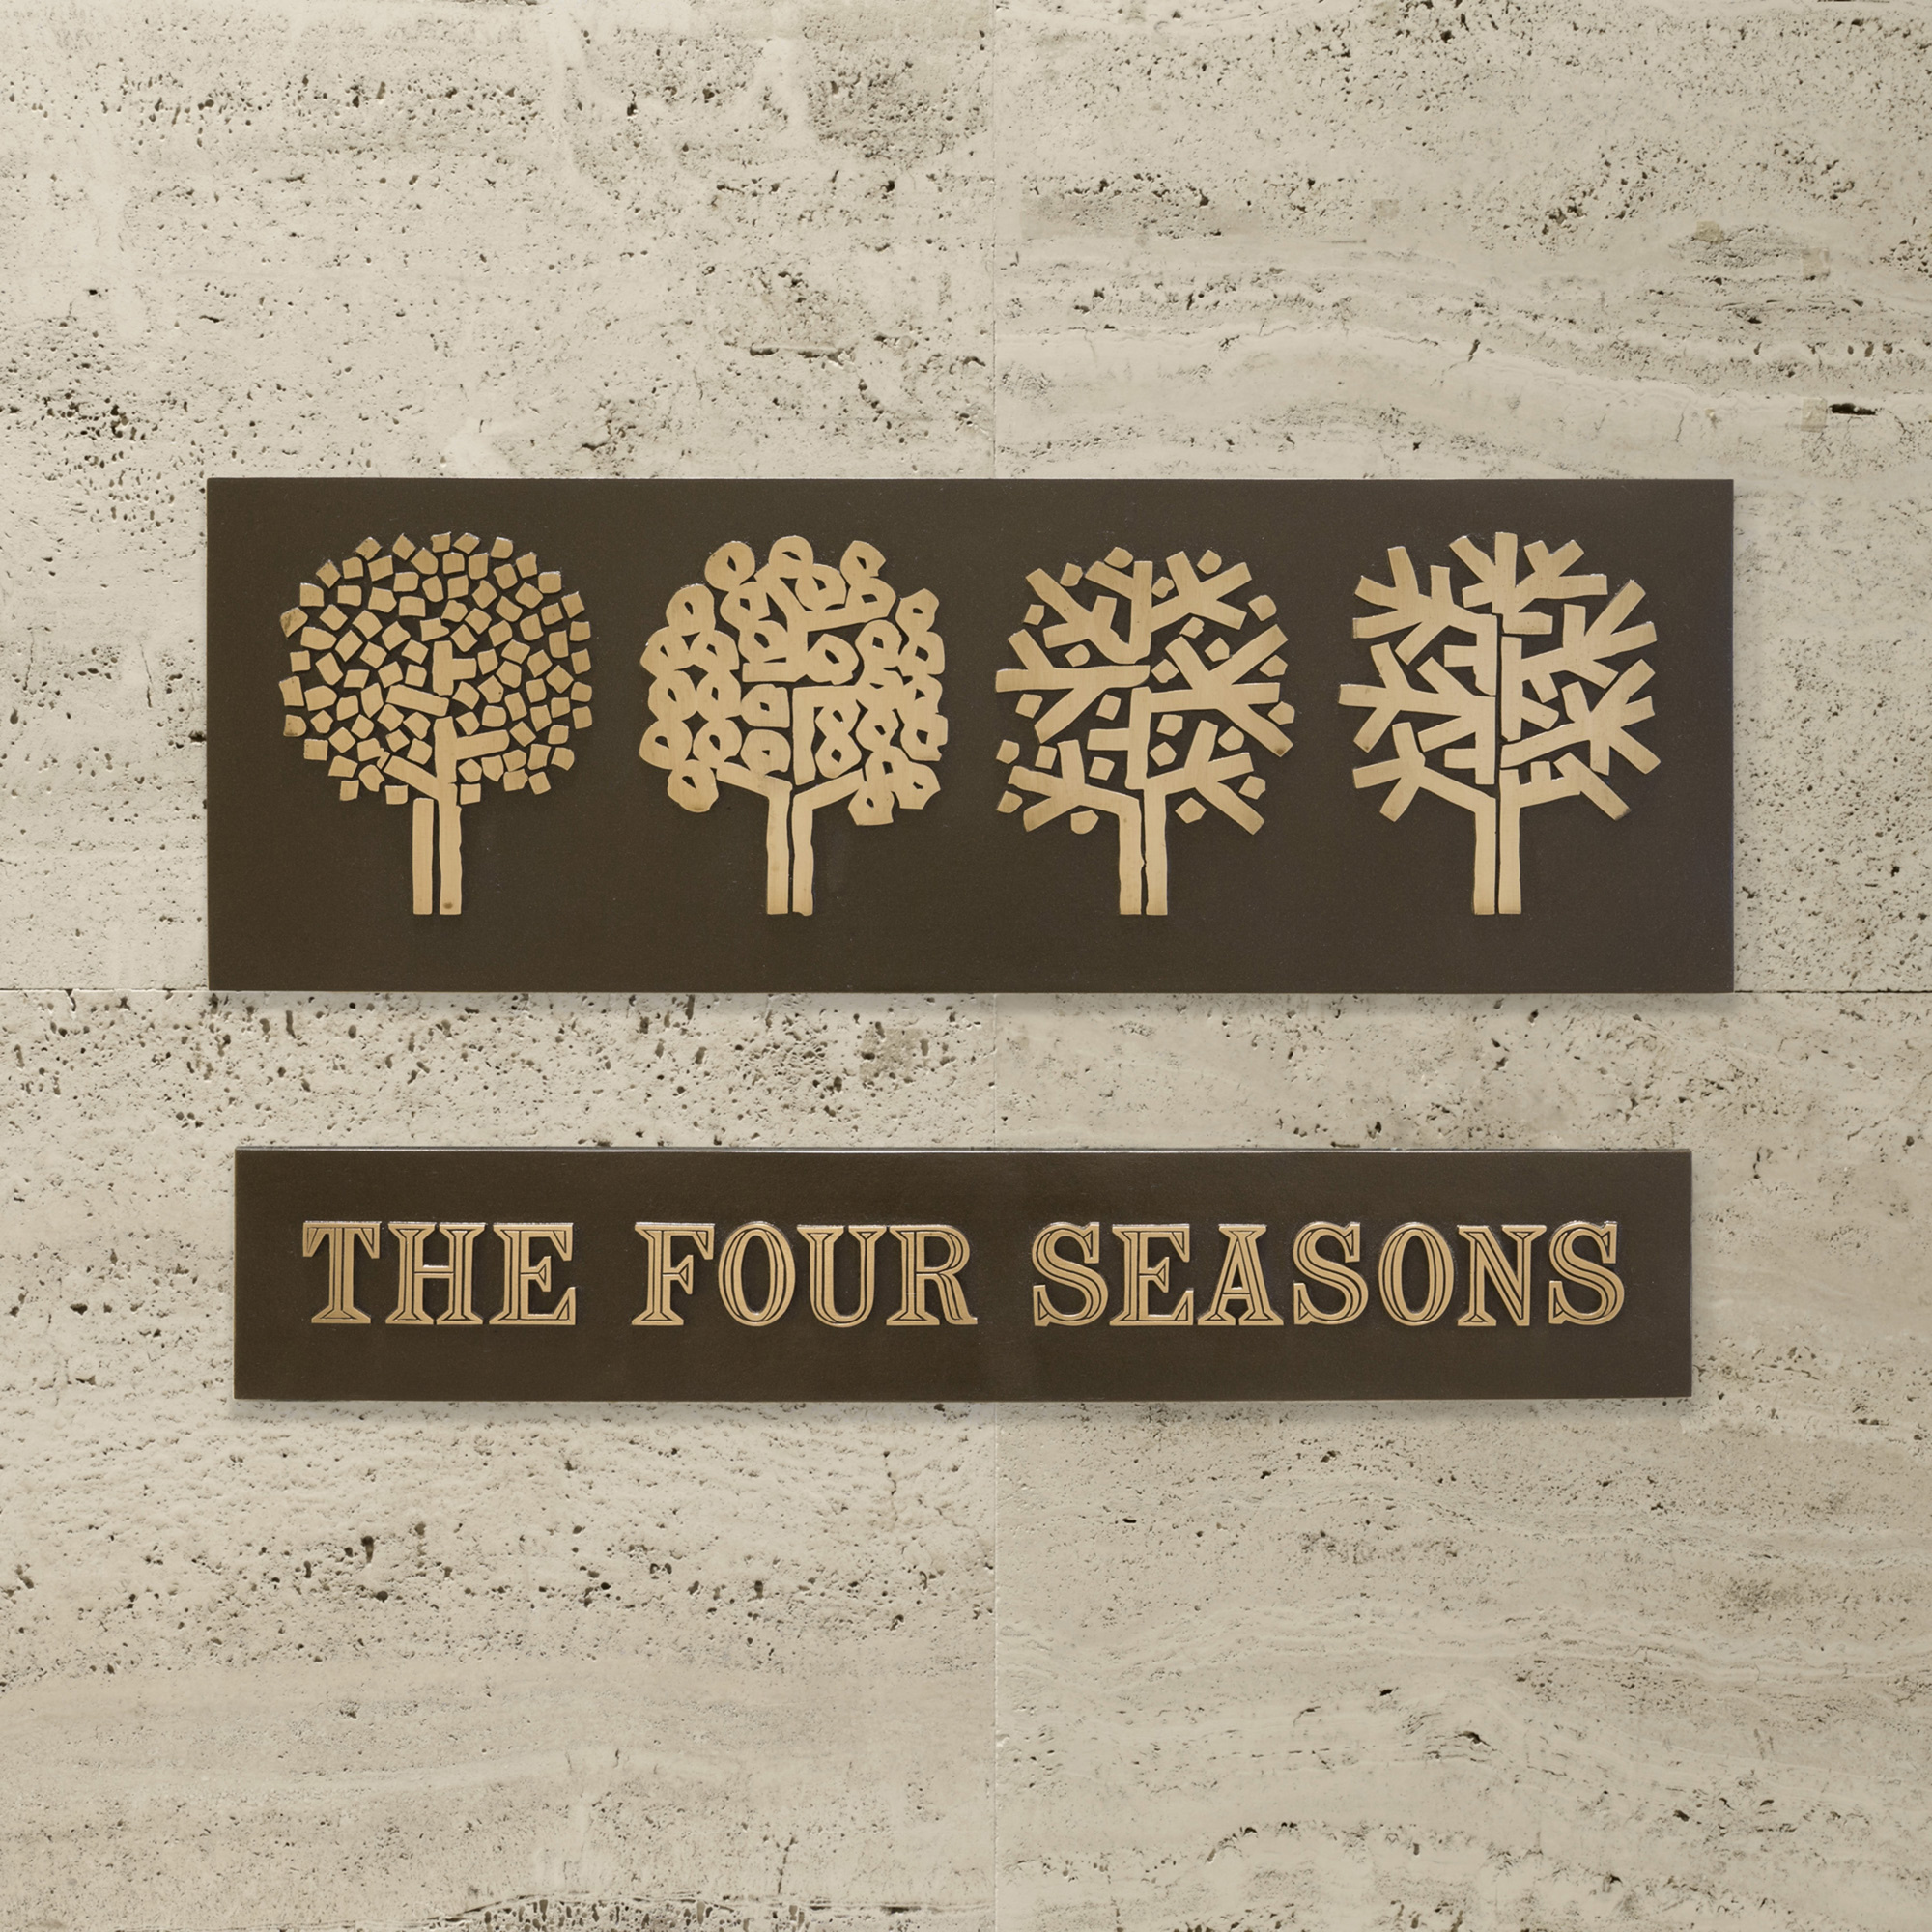 100: Emil Antonucci / The Four Seasons sign (1 of 1)